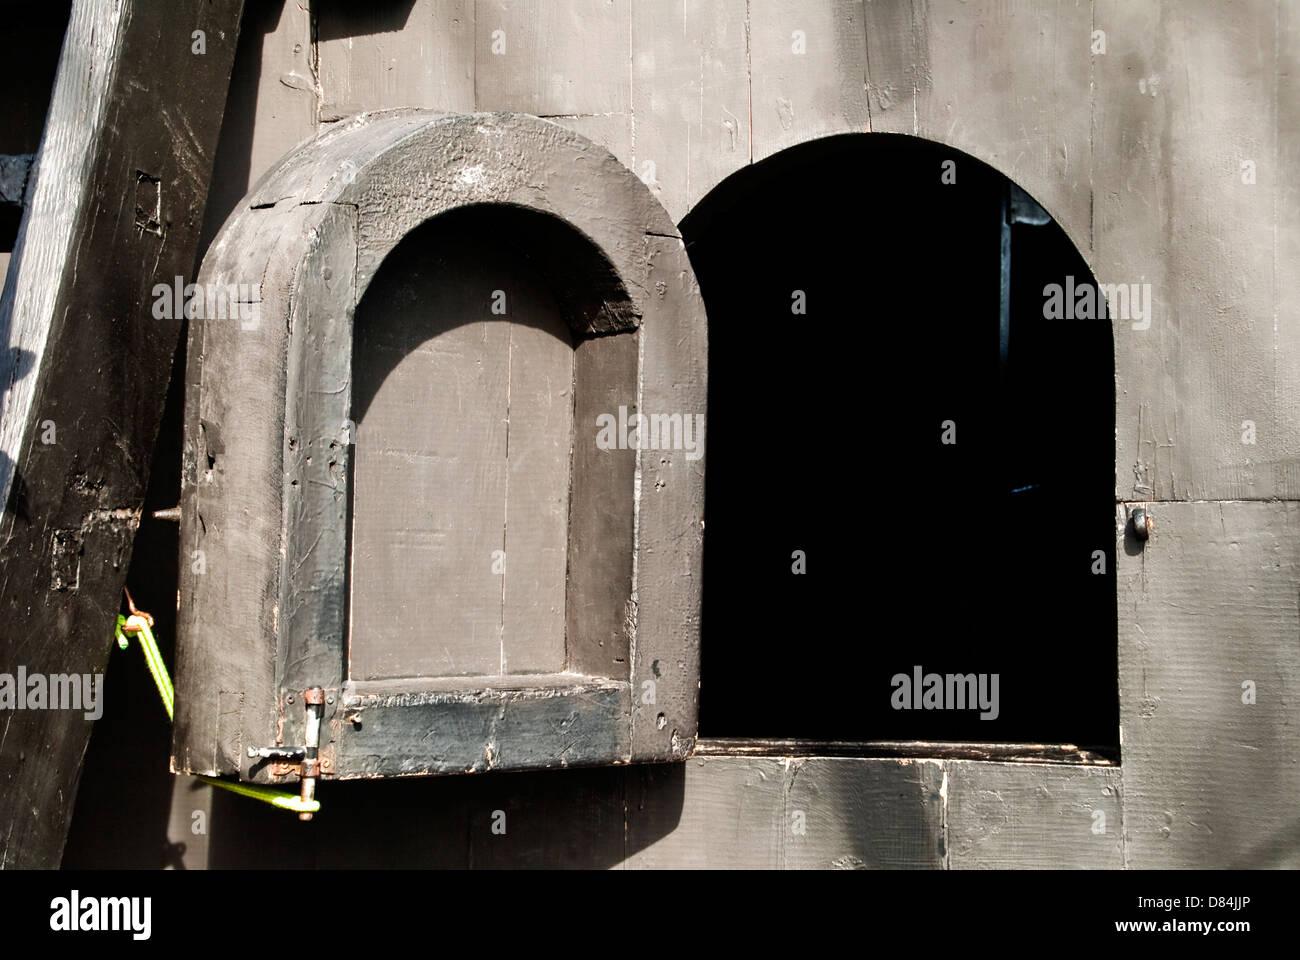 Ventana del camarote de un barco – Window of ship's cabin Stock Photo